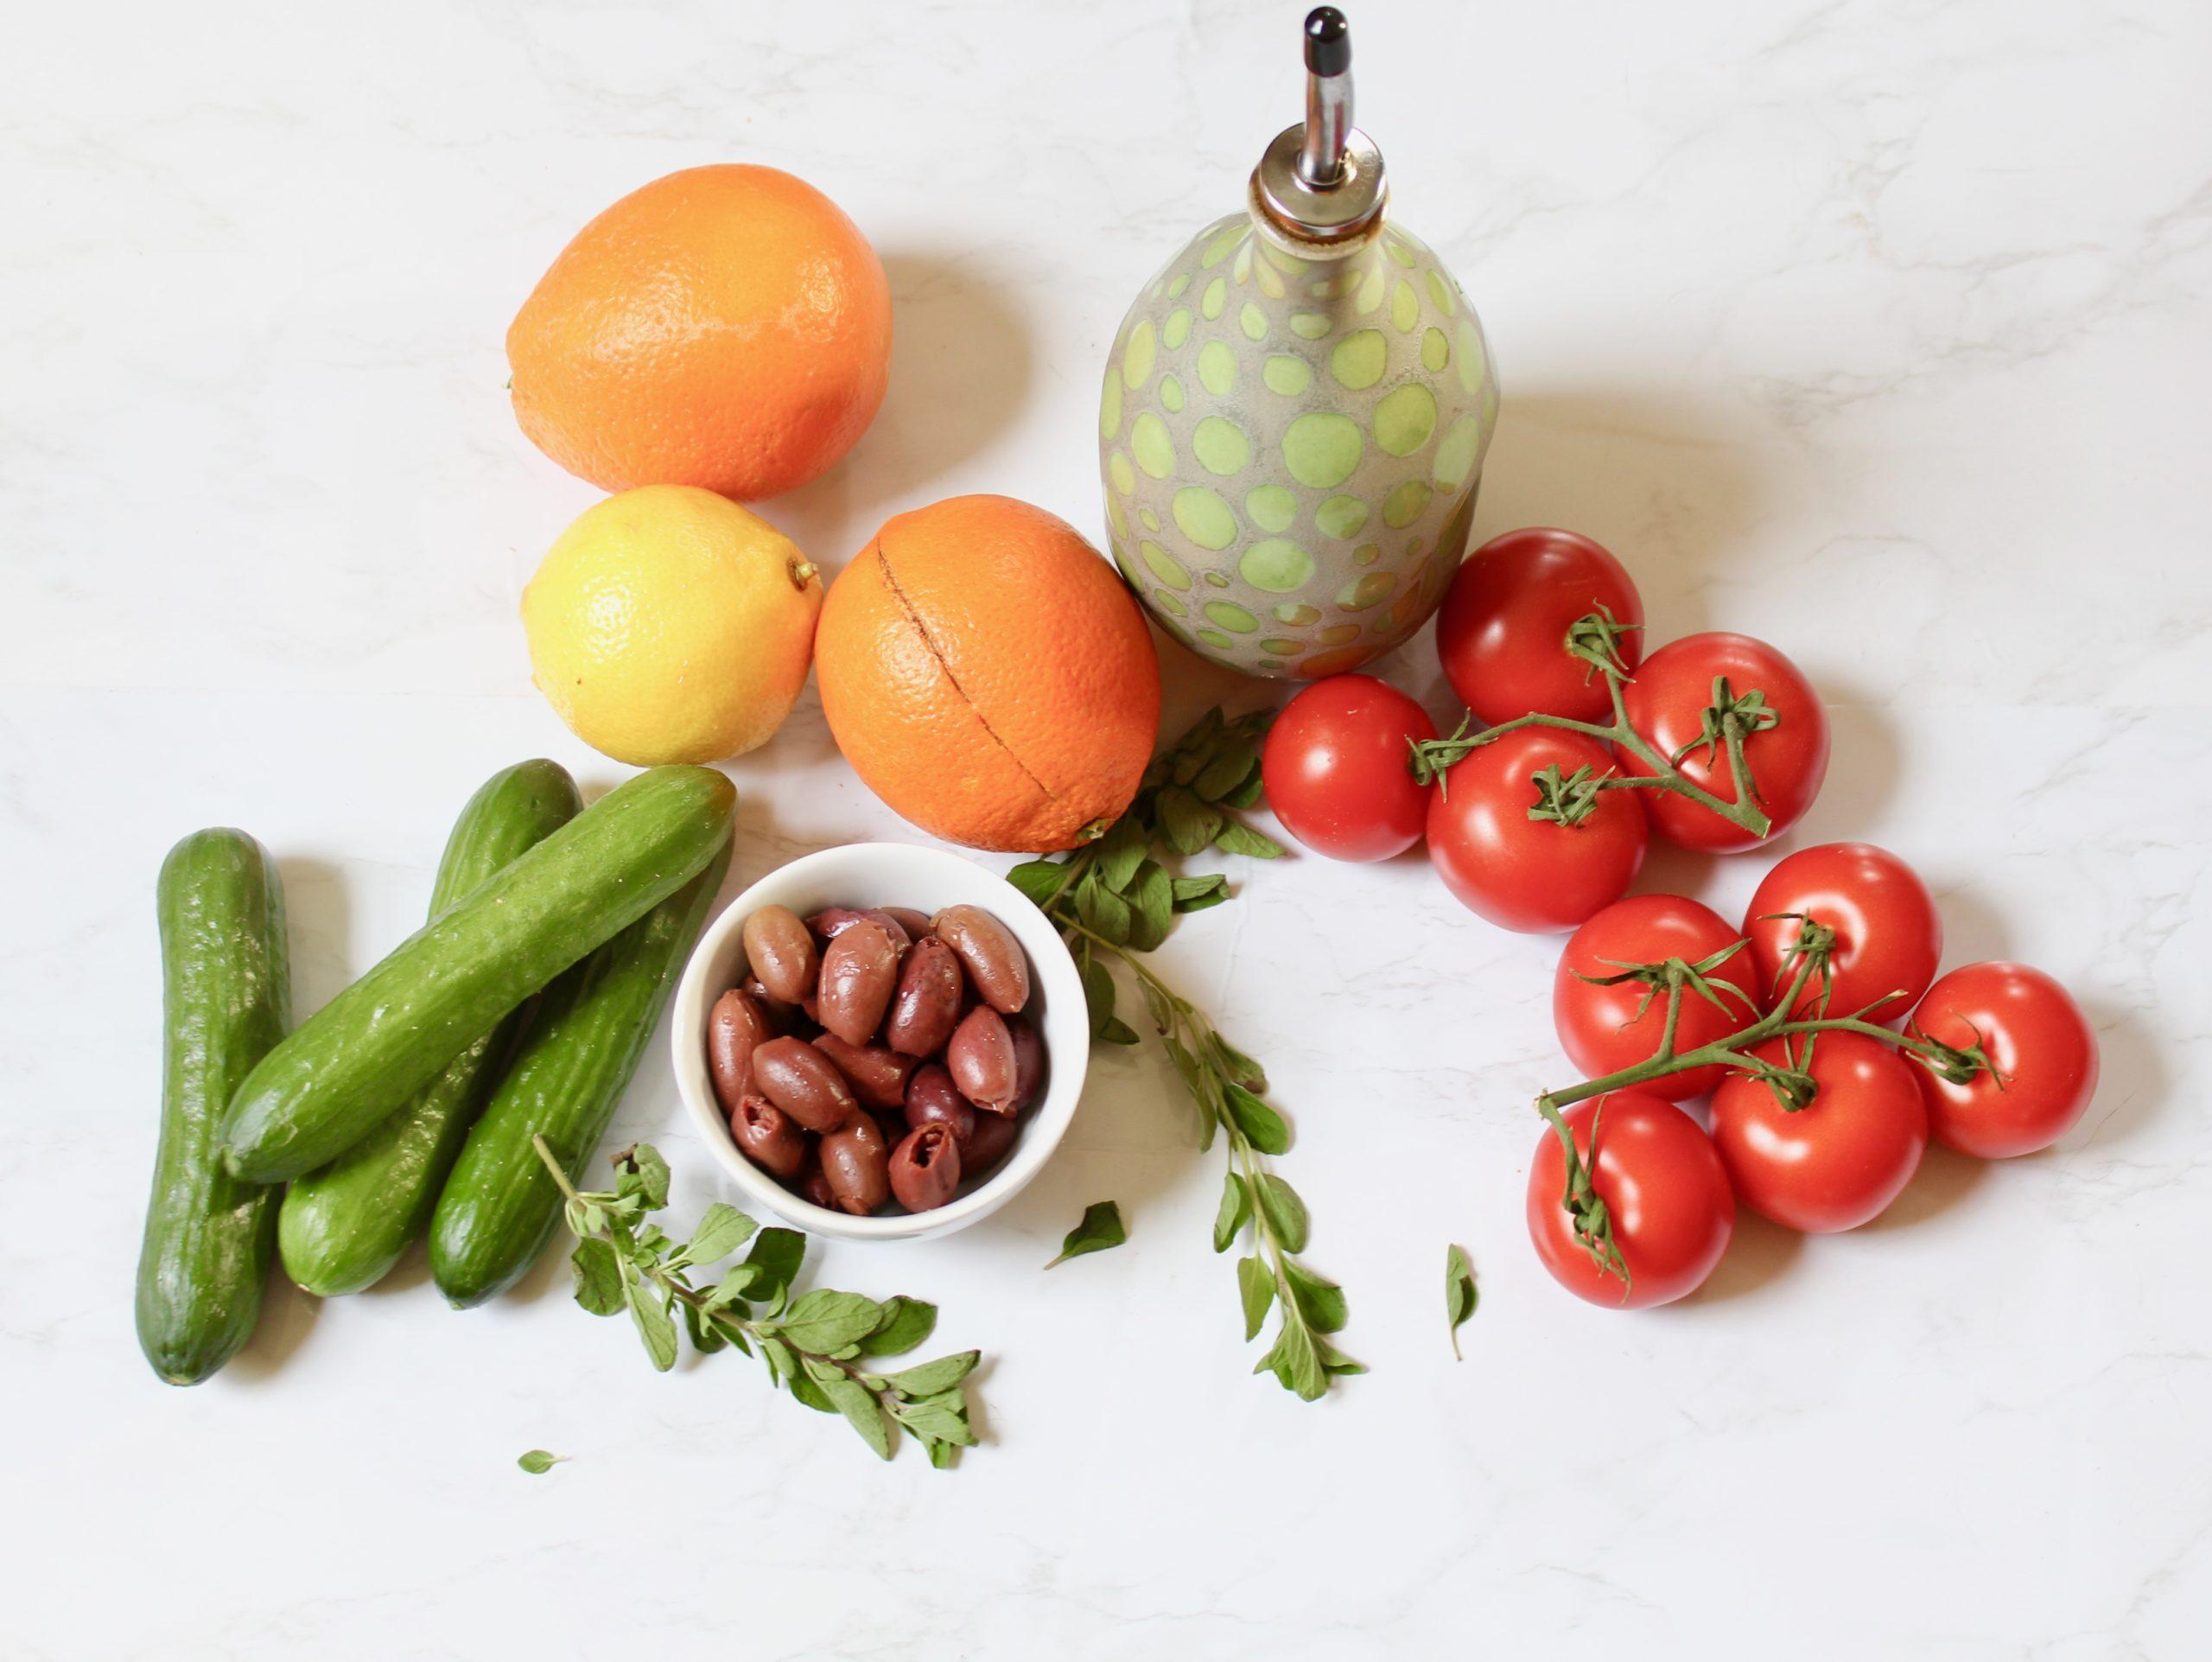 ingredients for greek salad with orange